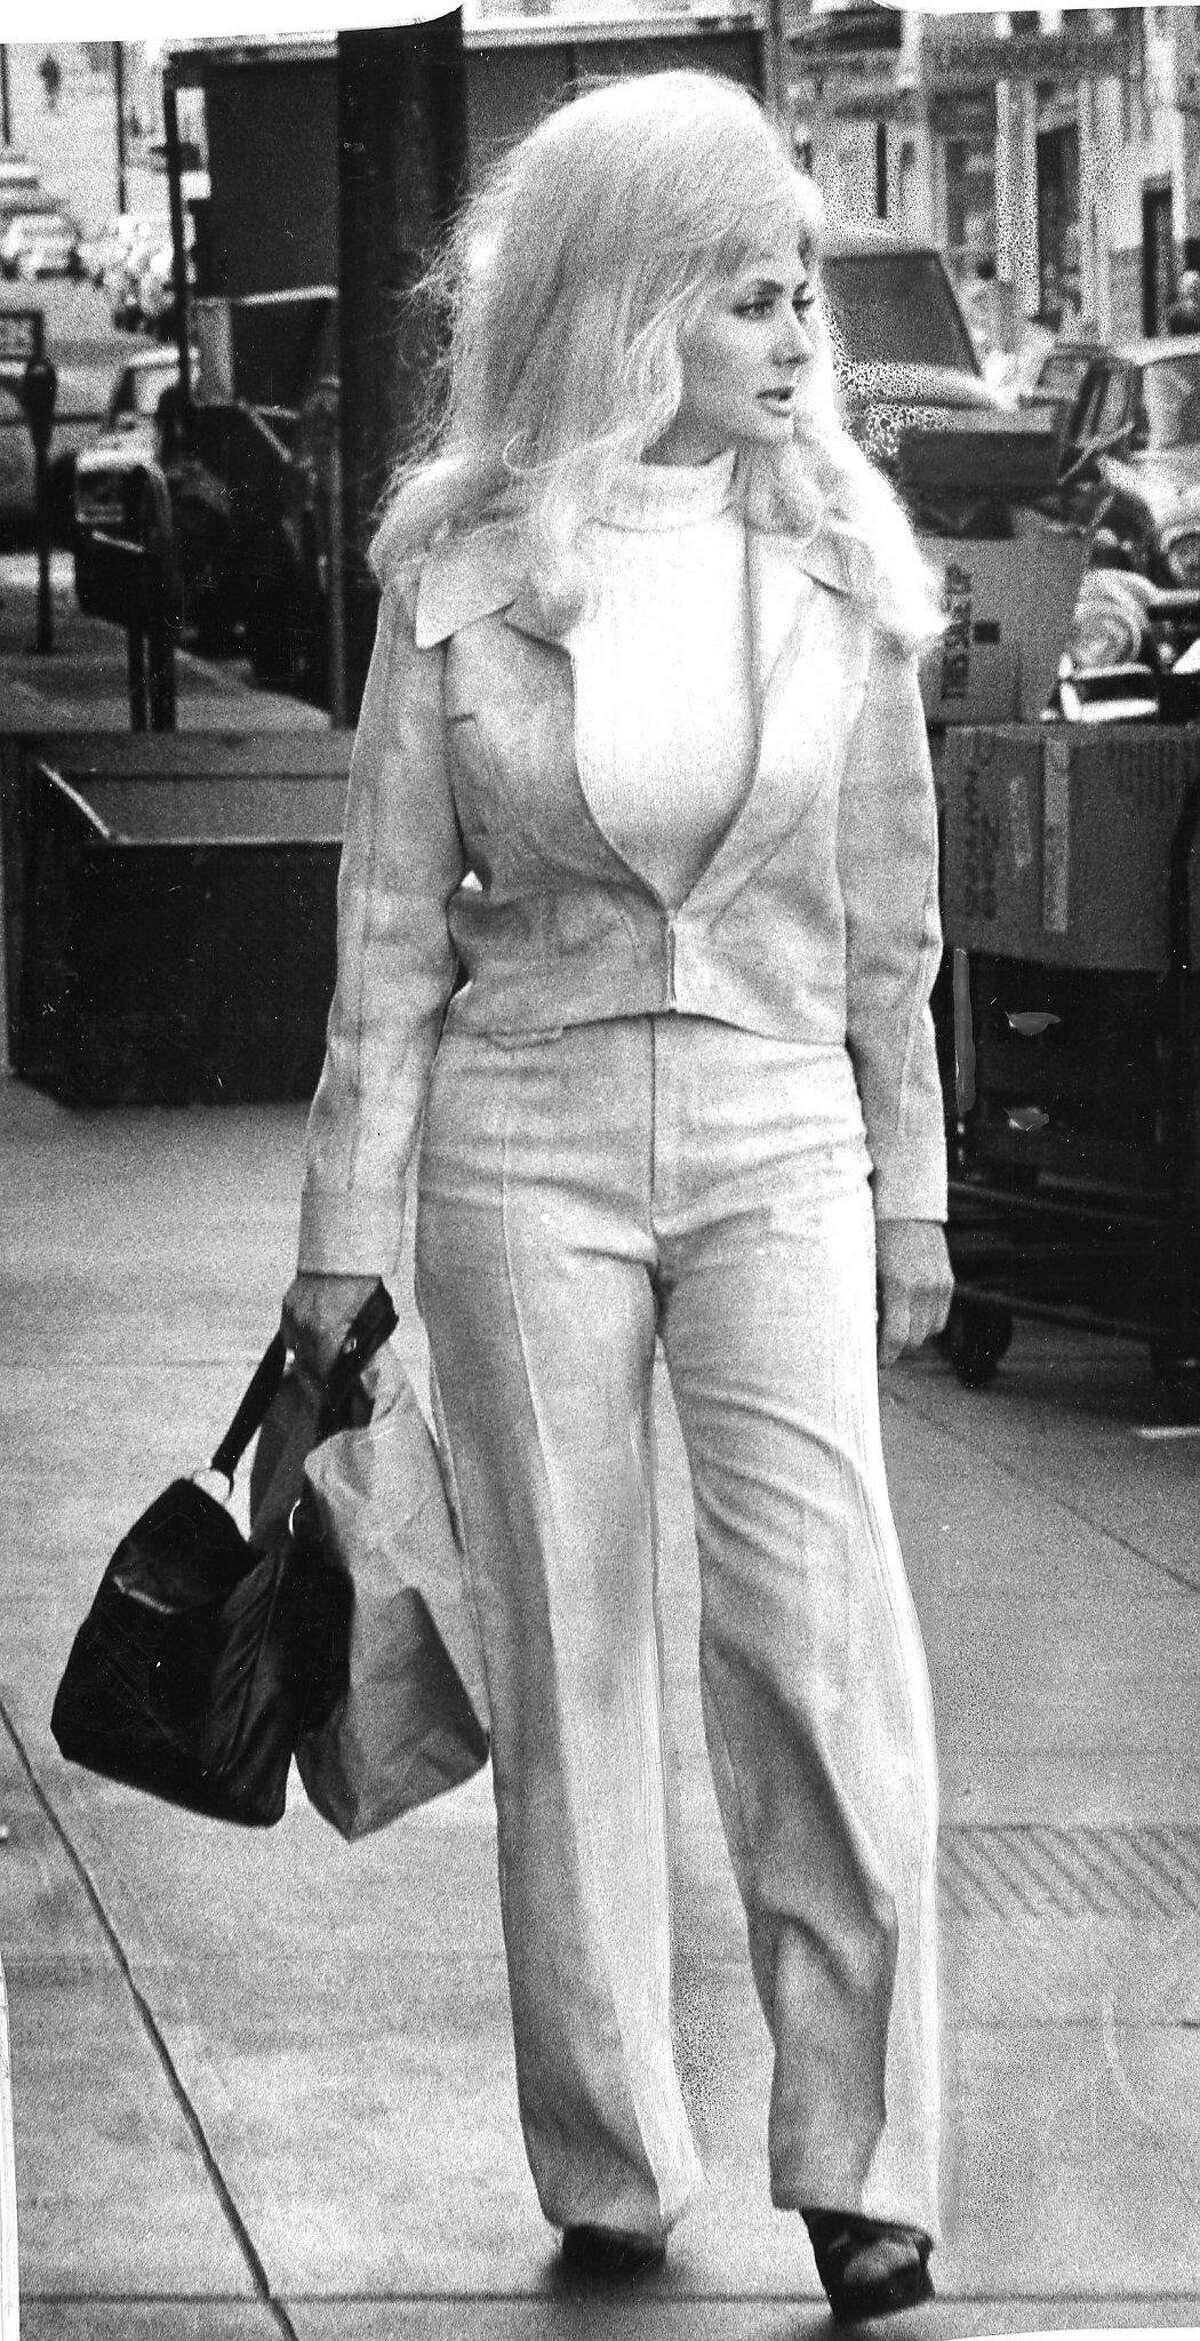 Carol Doda doing some shopping in 1975.